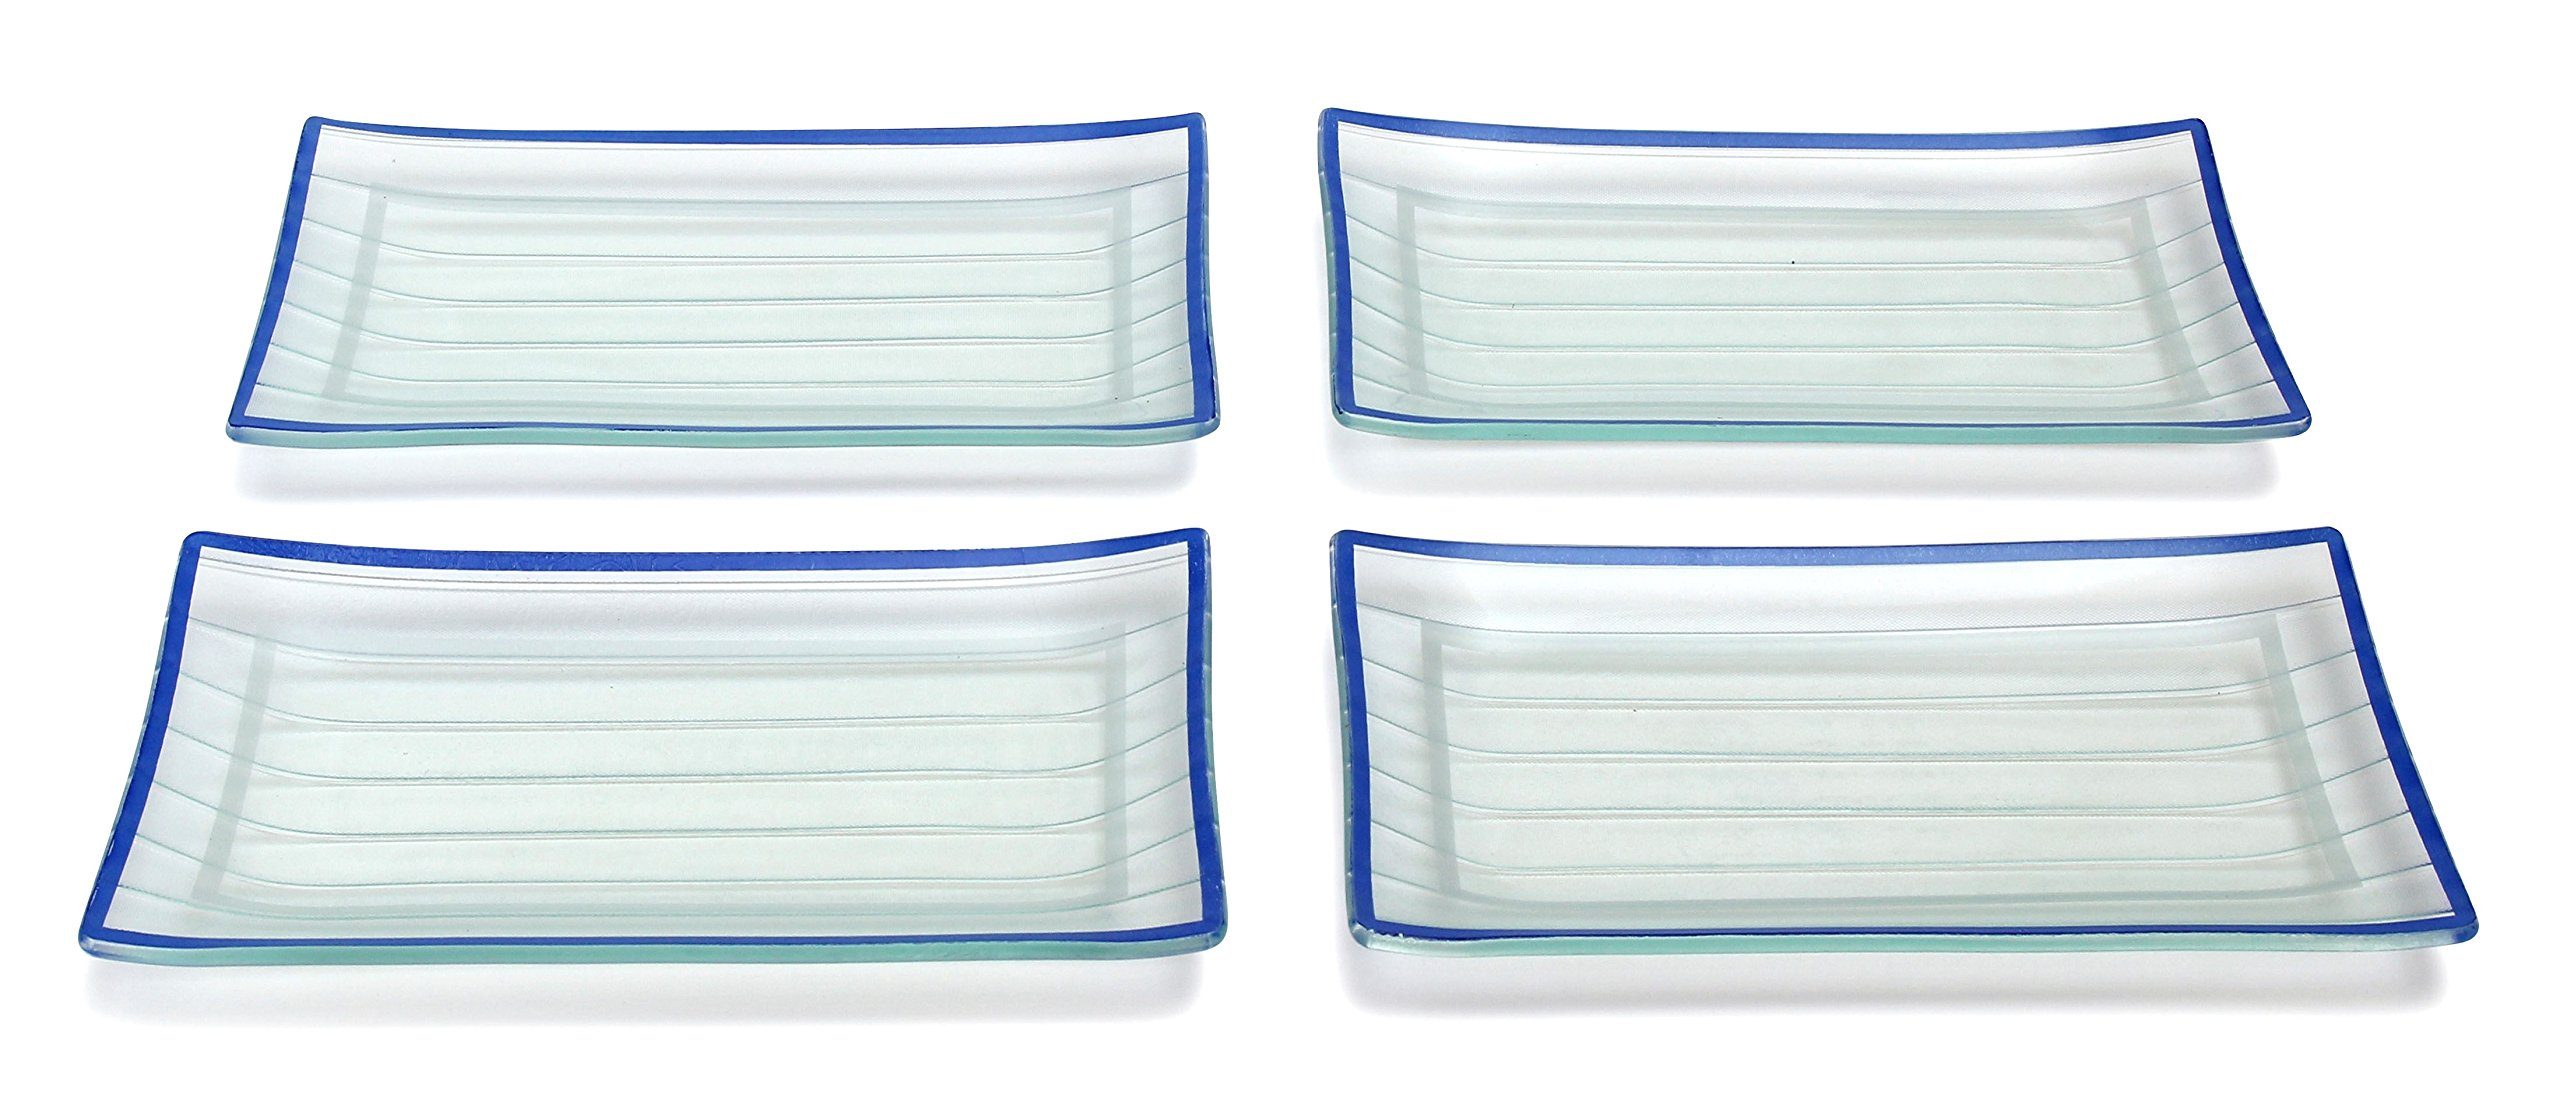 GAC Rectangular Tempered Glass Salad/Dessert Plate Set With Blue Trim, Service for 4, Break and Chip Resistant – Microwave and Oven Safe – Dishwasher Safe - Decorative Serving Plate